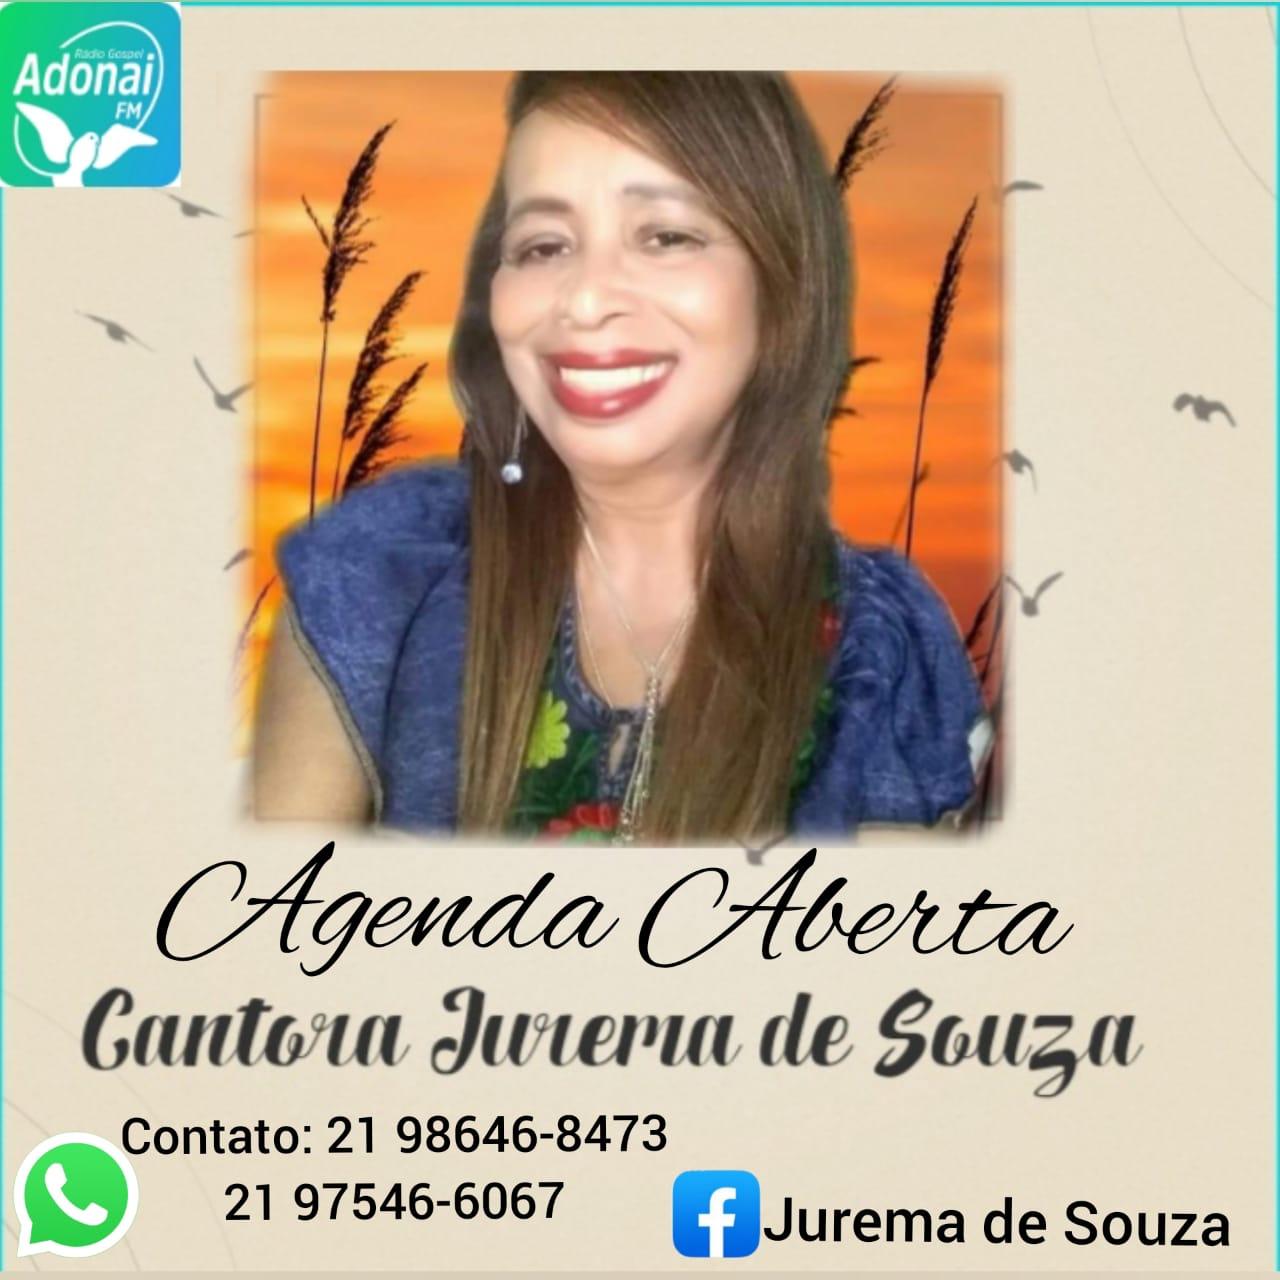 Publicidade Cantora Jurema de Souza